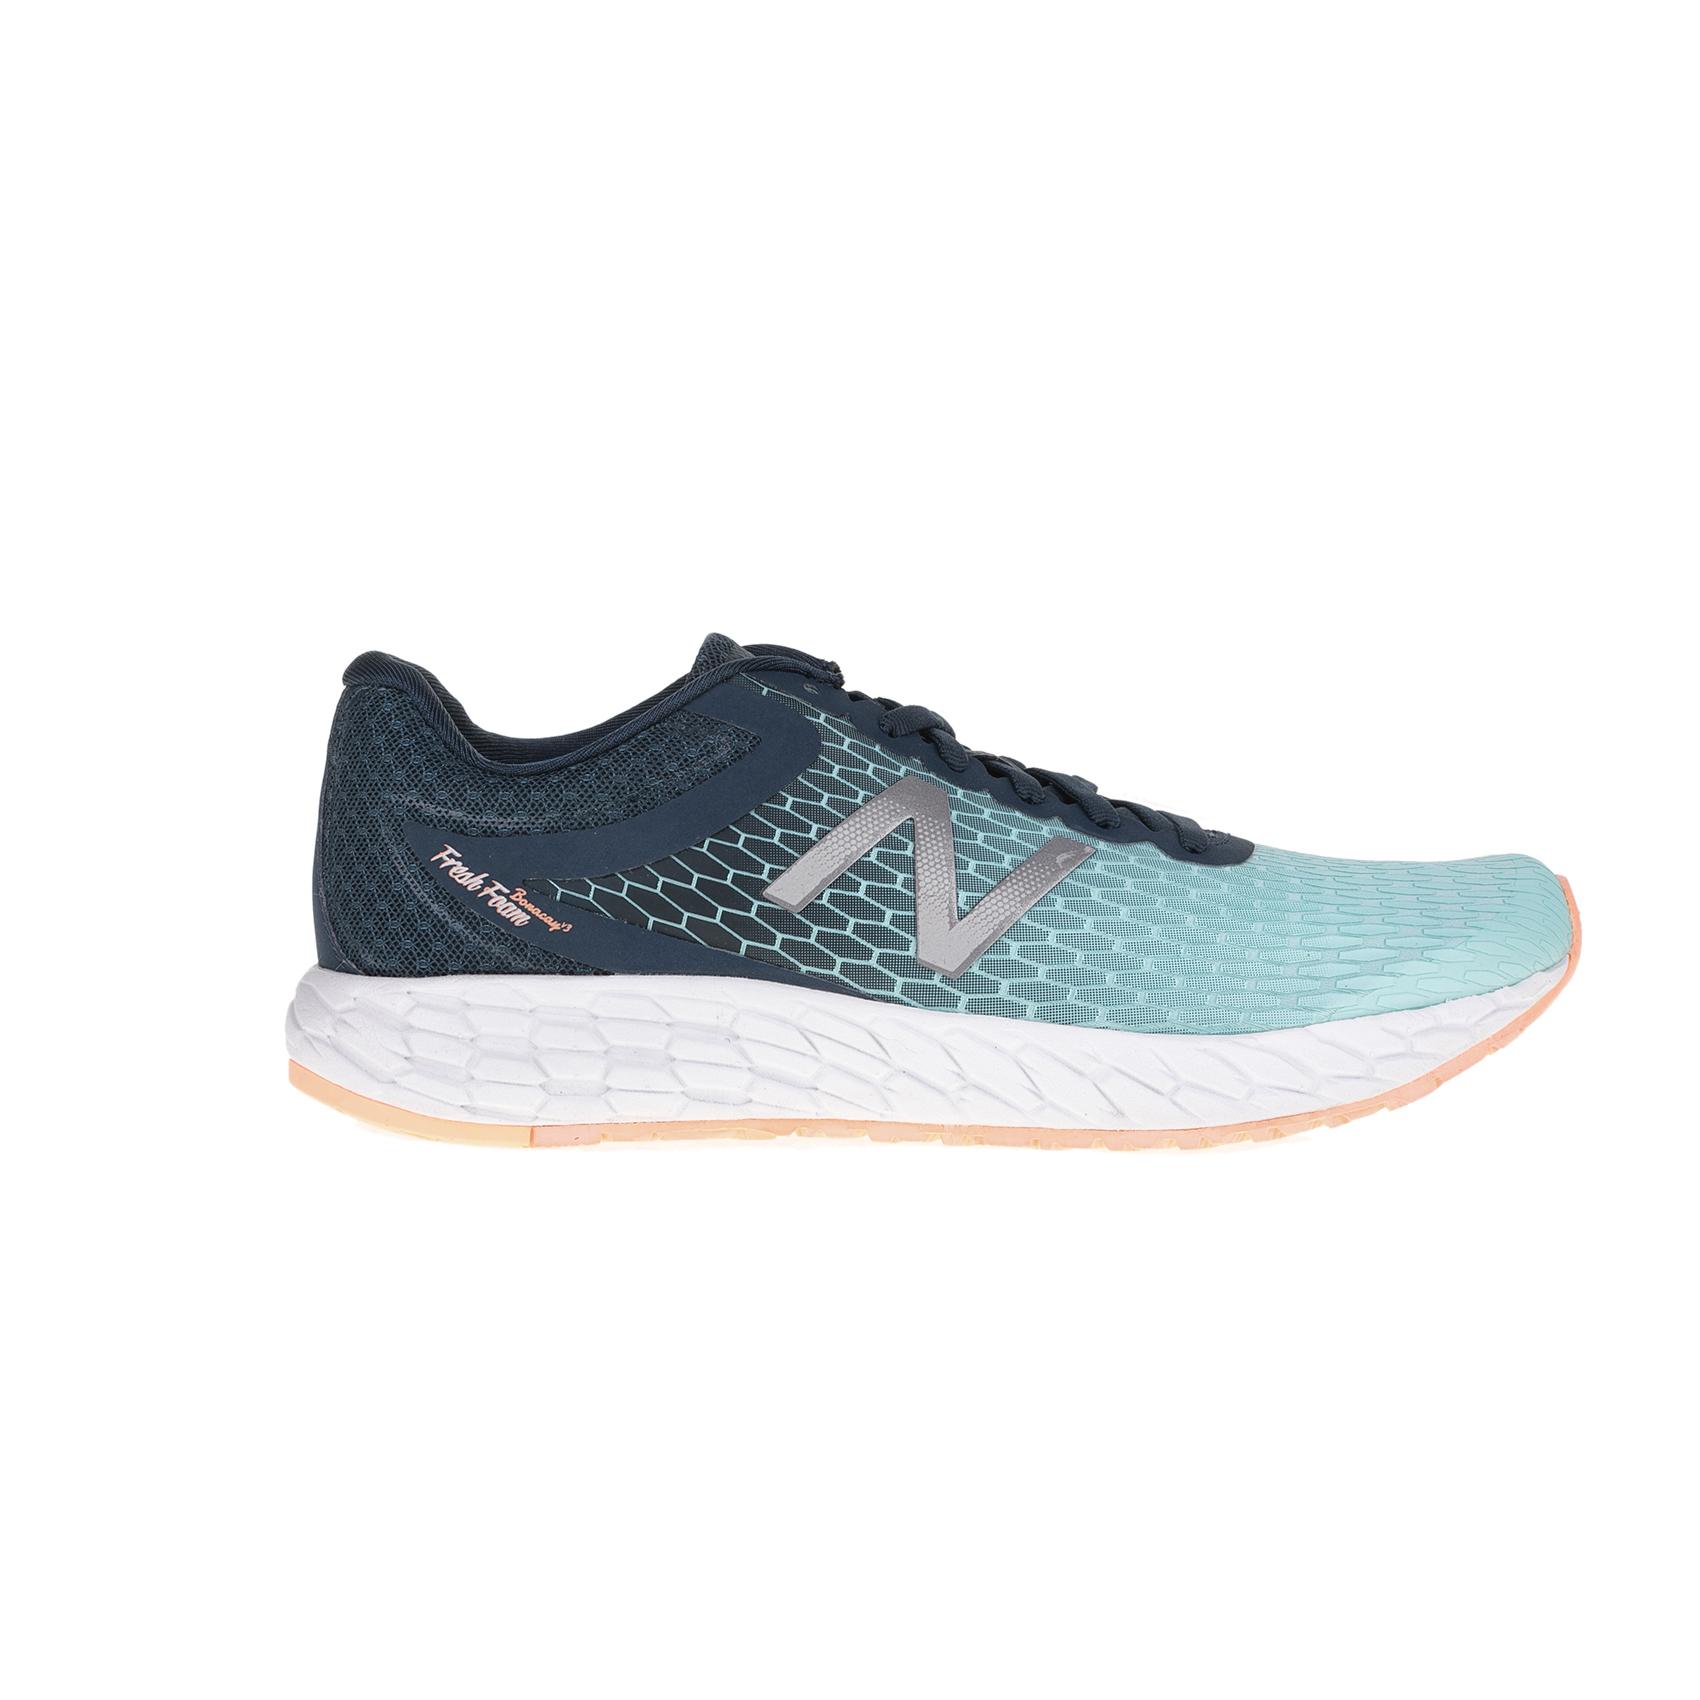 NEW BALANCE - Γυναικεία παπούτσια για τρέξιμο NEW BALANCE τιρκουάζ-μπλε γυναικεία παπούτσια αθλητικά running